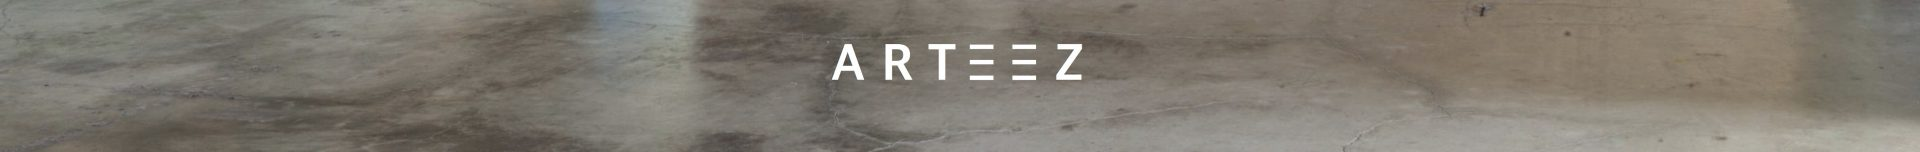 cropped-arteez_logo1.jpg